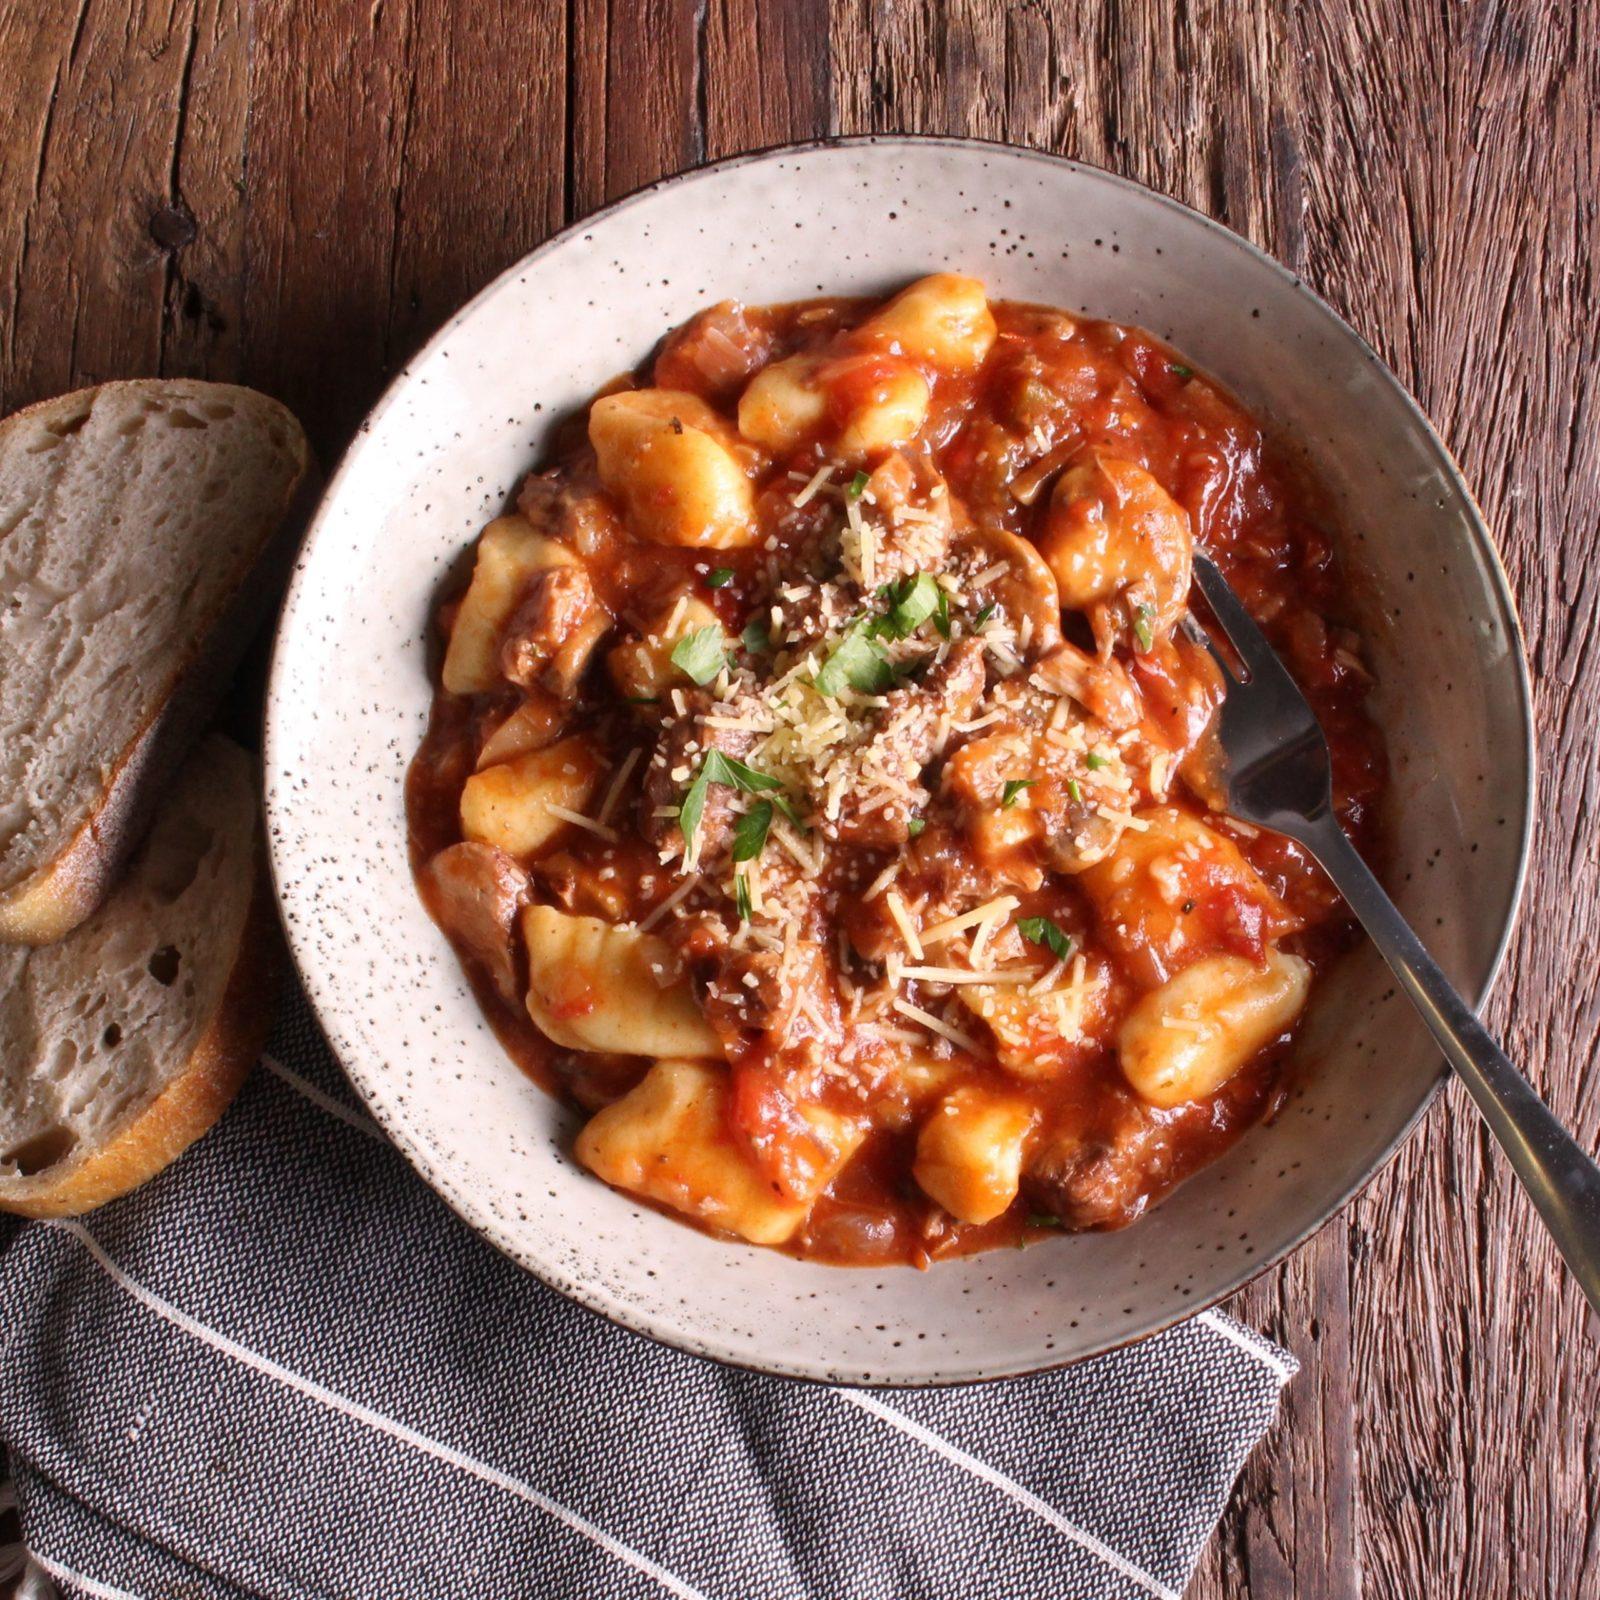 Potato Gnocchi with Pork and Wild Mushroom Ragu